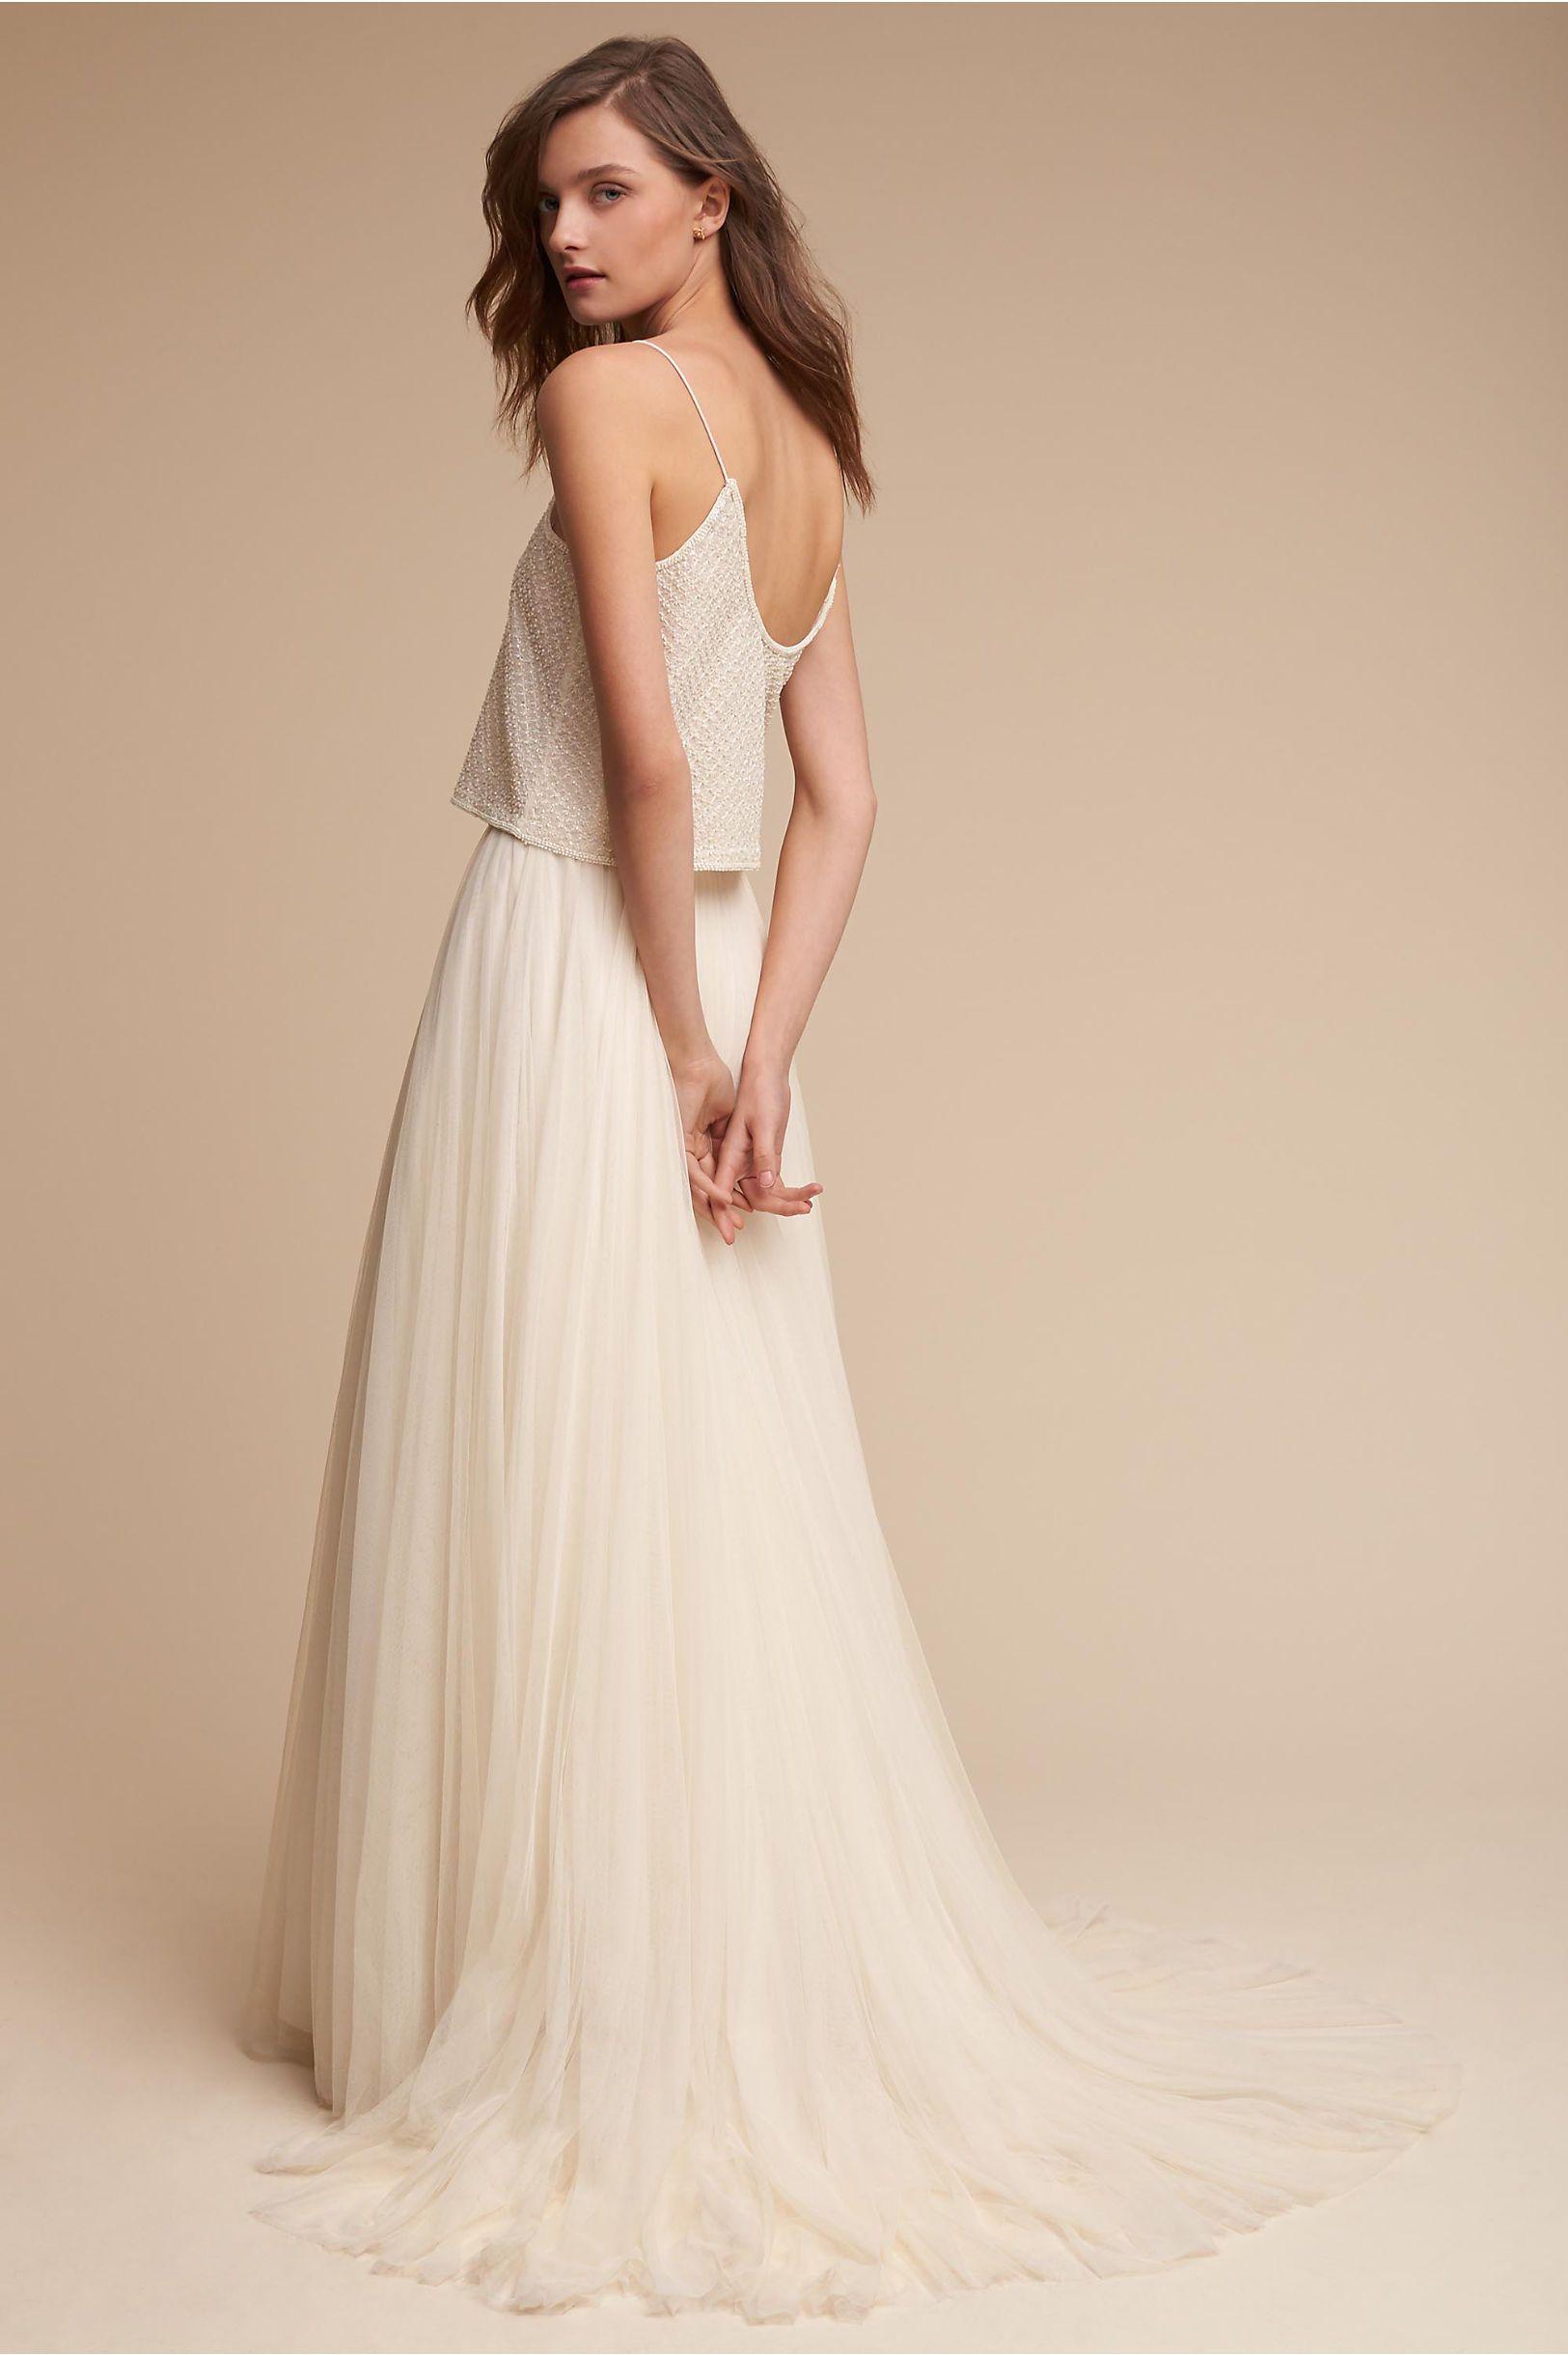 Bhldn cailey top u amora skirt in bride wedding dresses bhldn